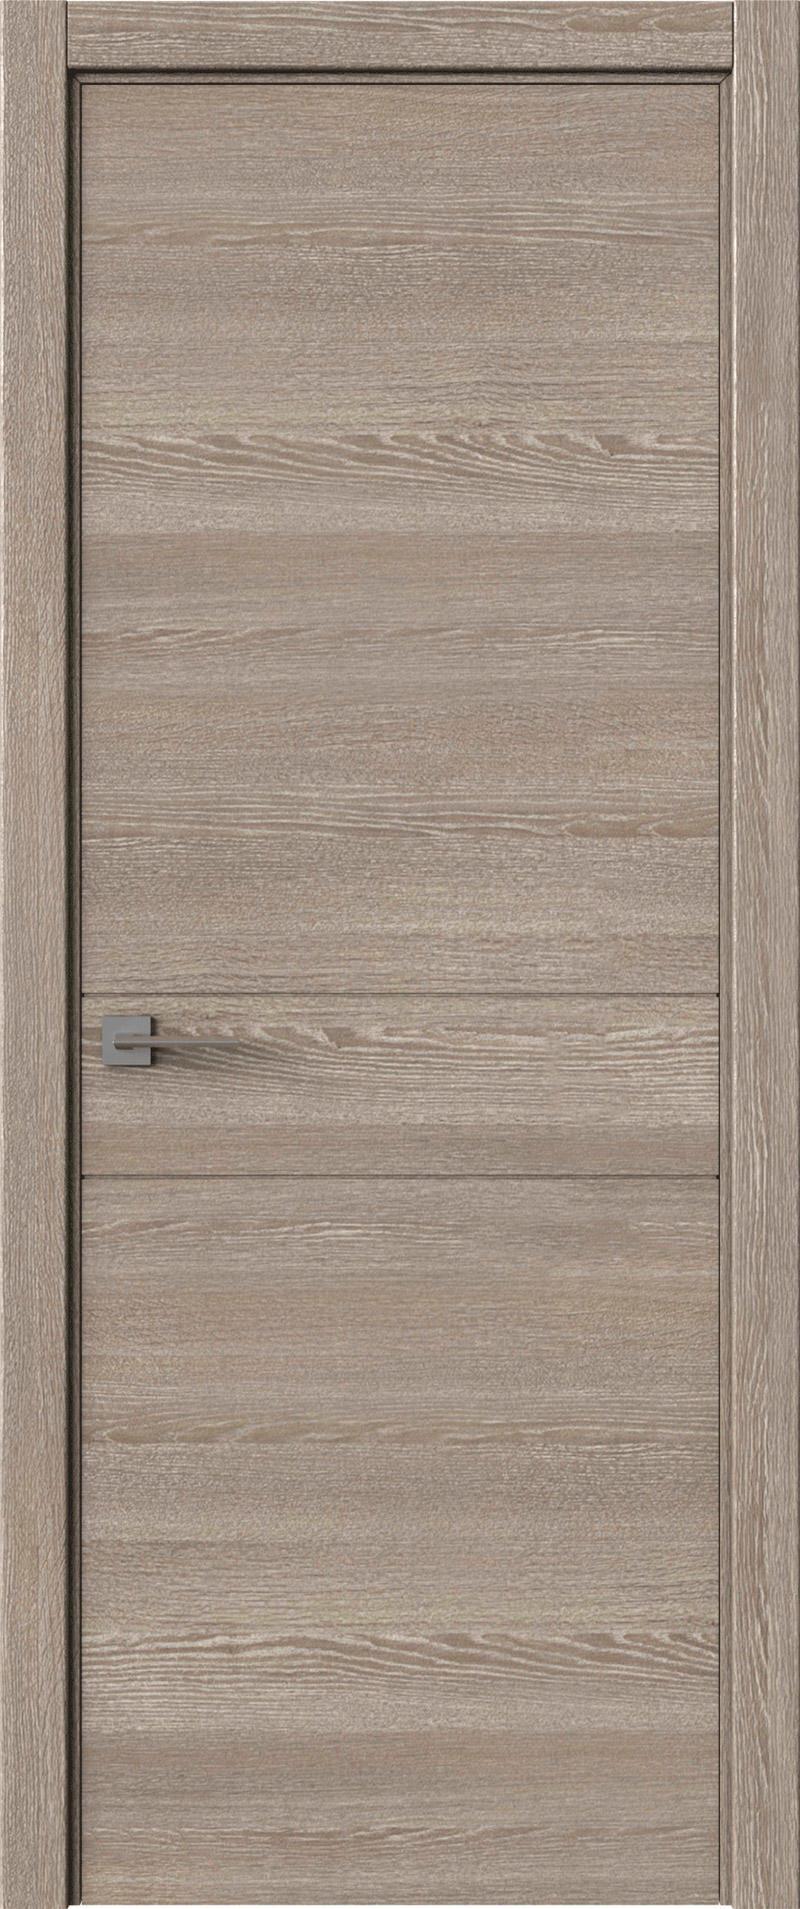 Tivoli И-2 цвет - Серый дуб Без стекла (ДГ)